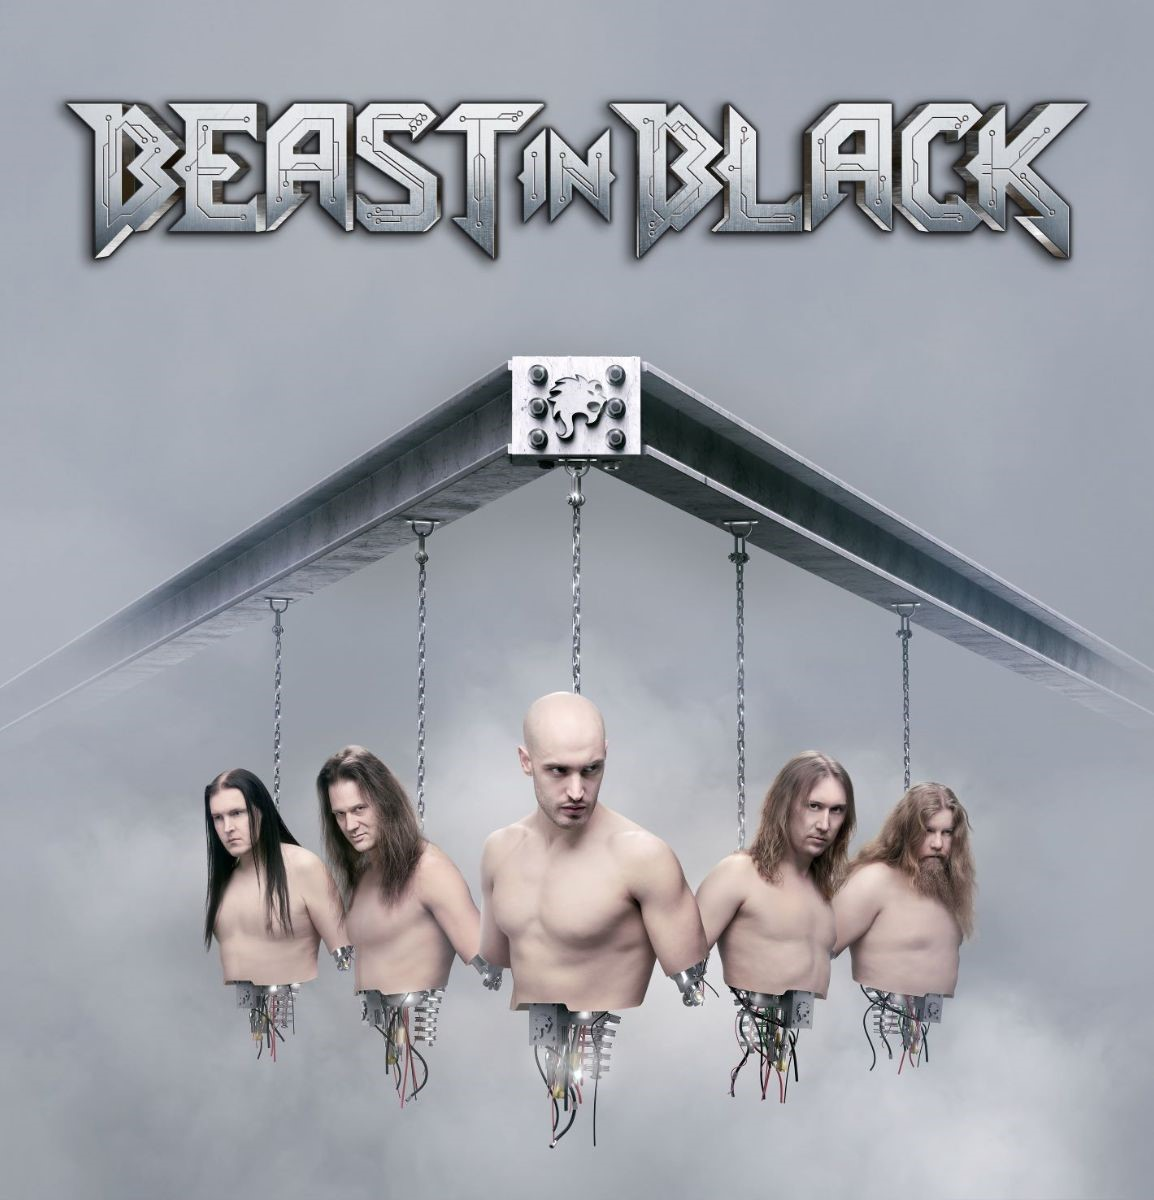 dark connection beast in black recensione